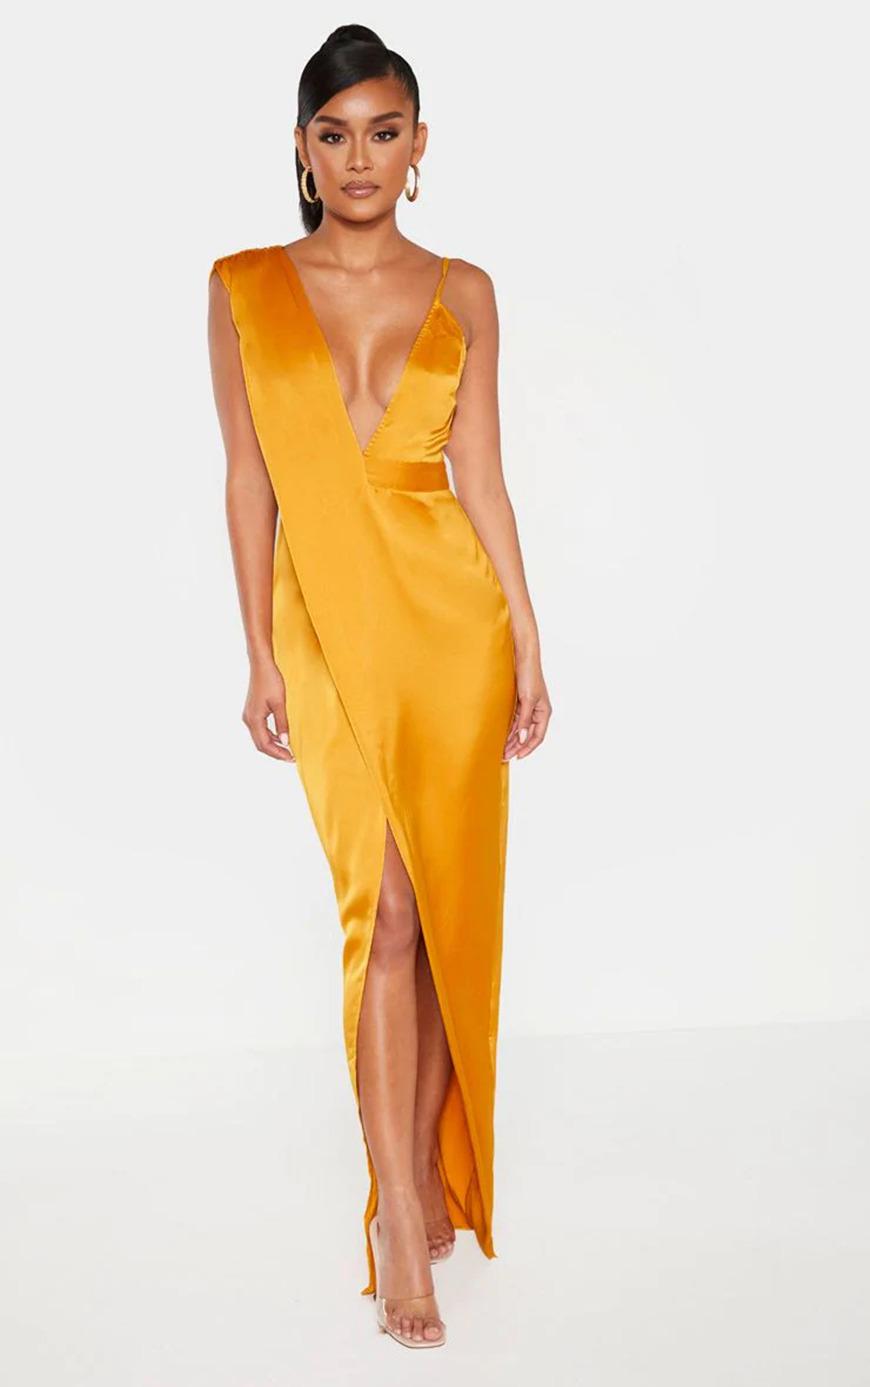 a-yellow-prom-dress